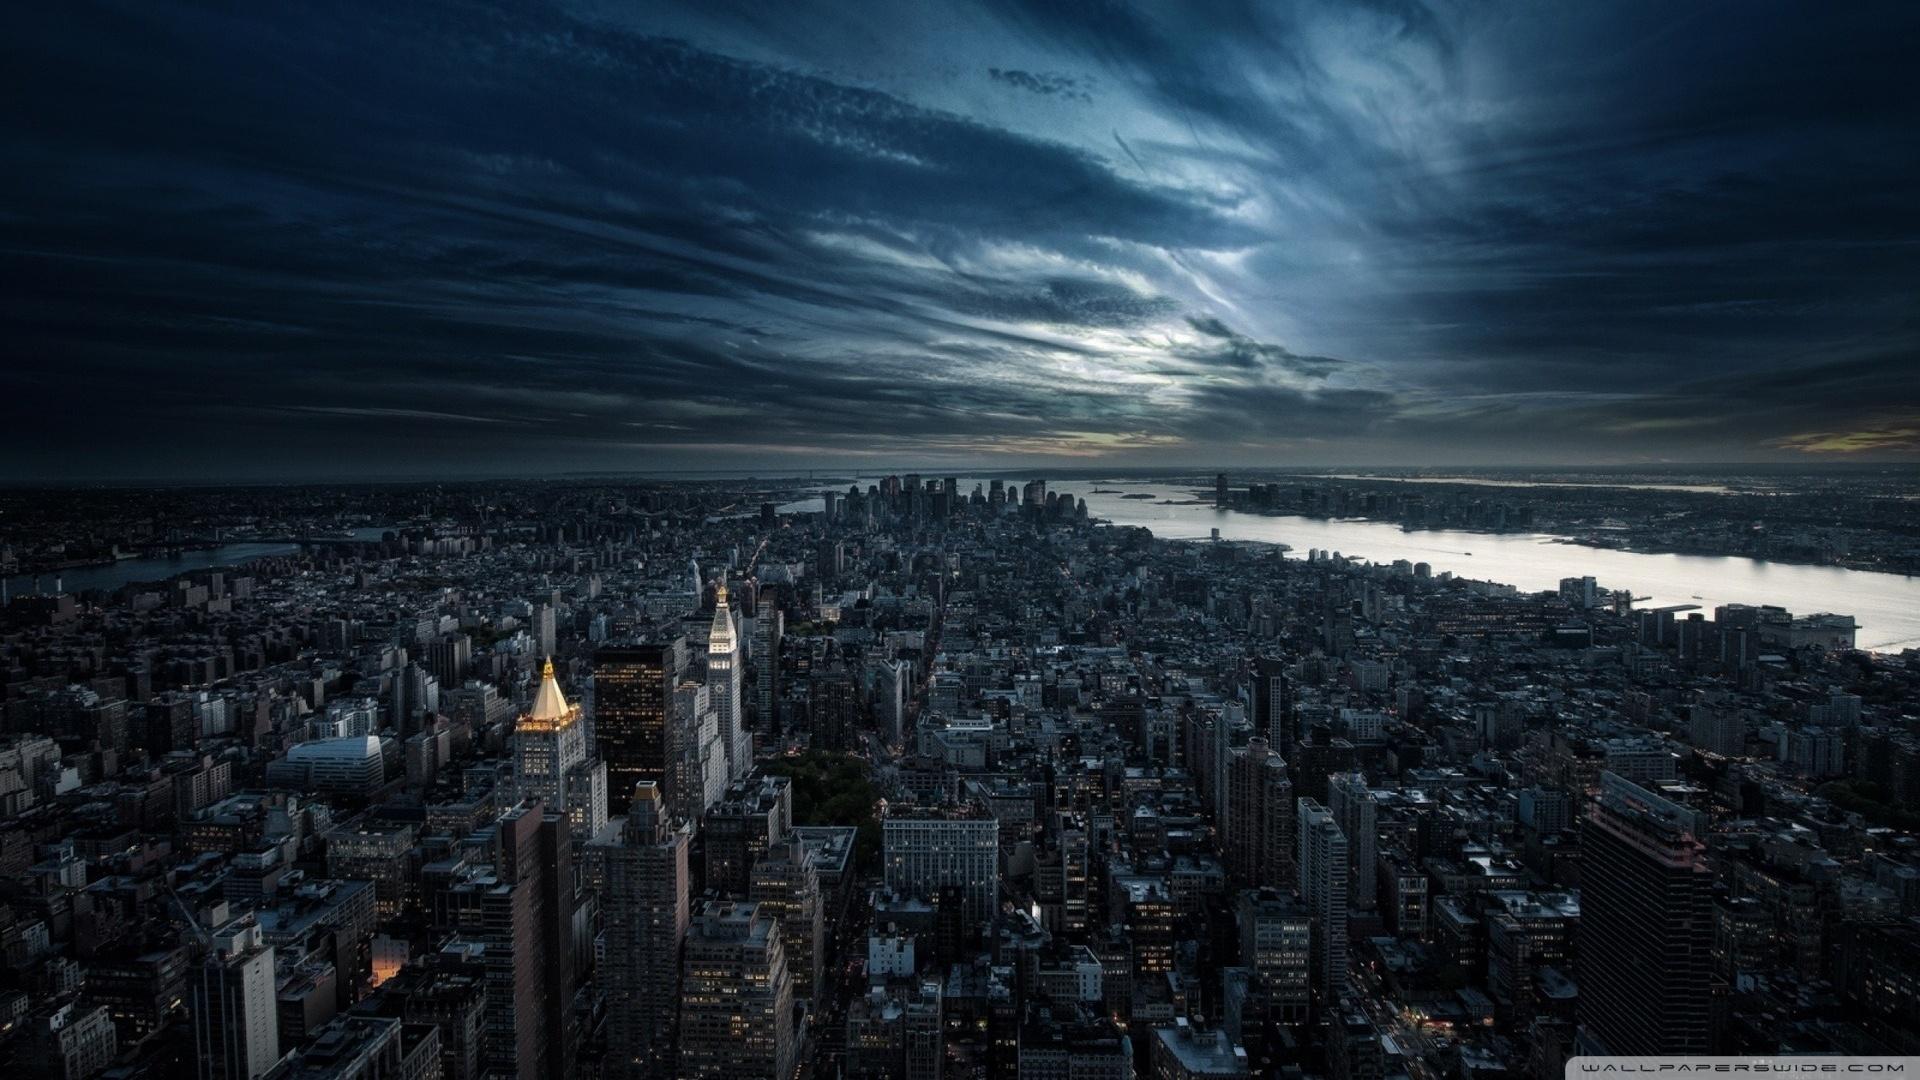 Wonderful City Night Wallpaper For Wallpapers Image - New York City - HD Wallpaper